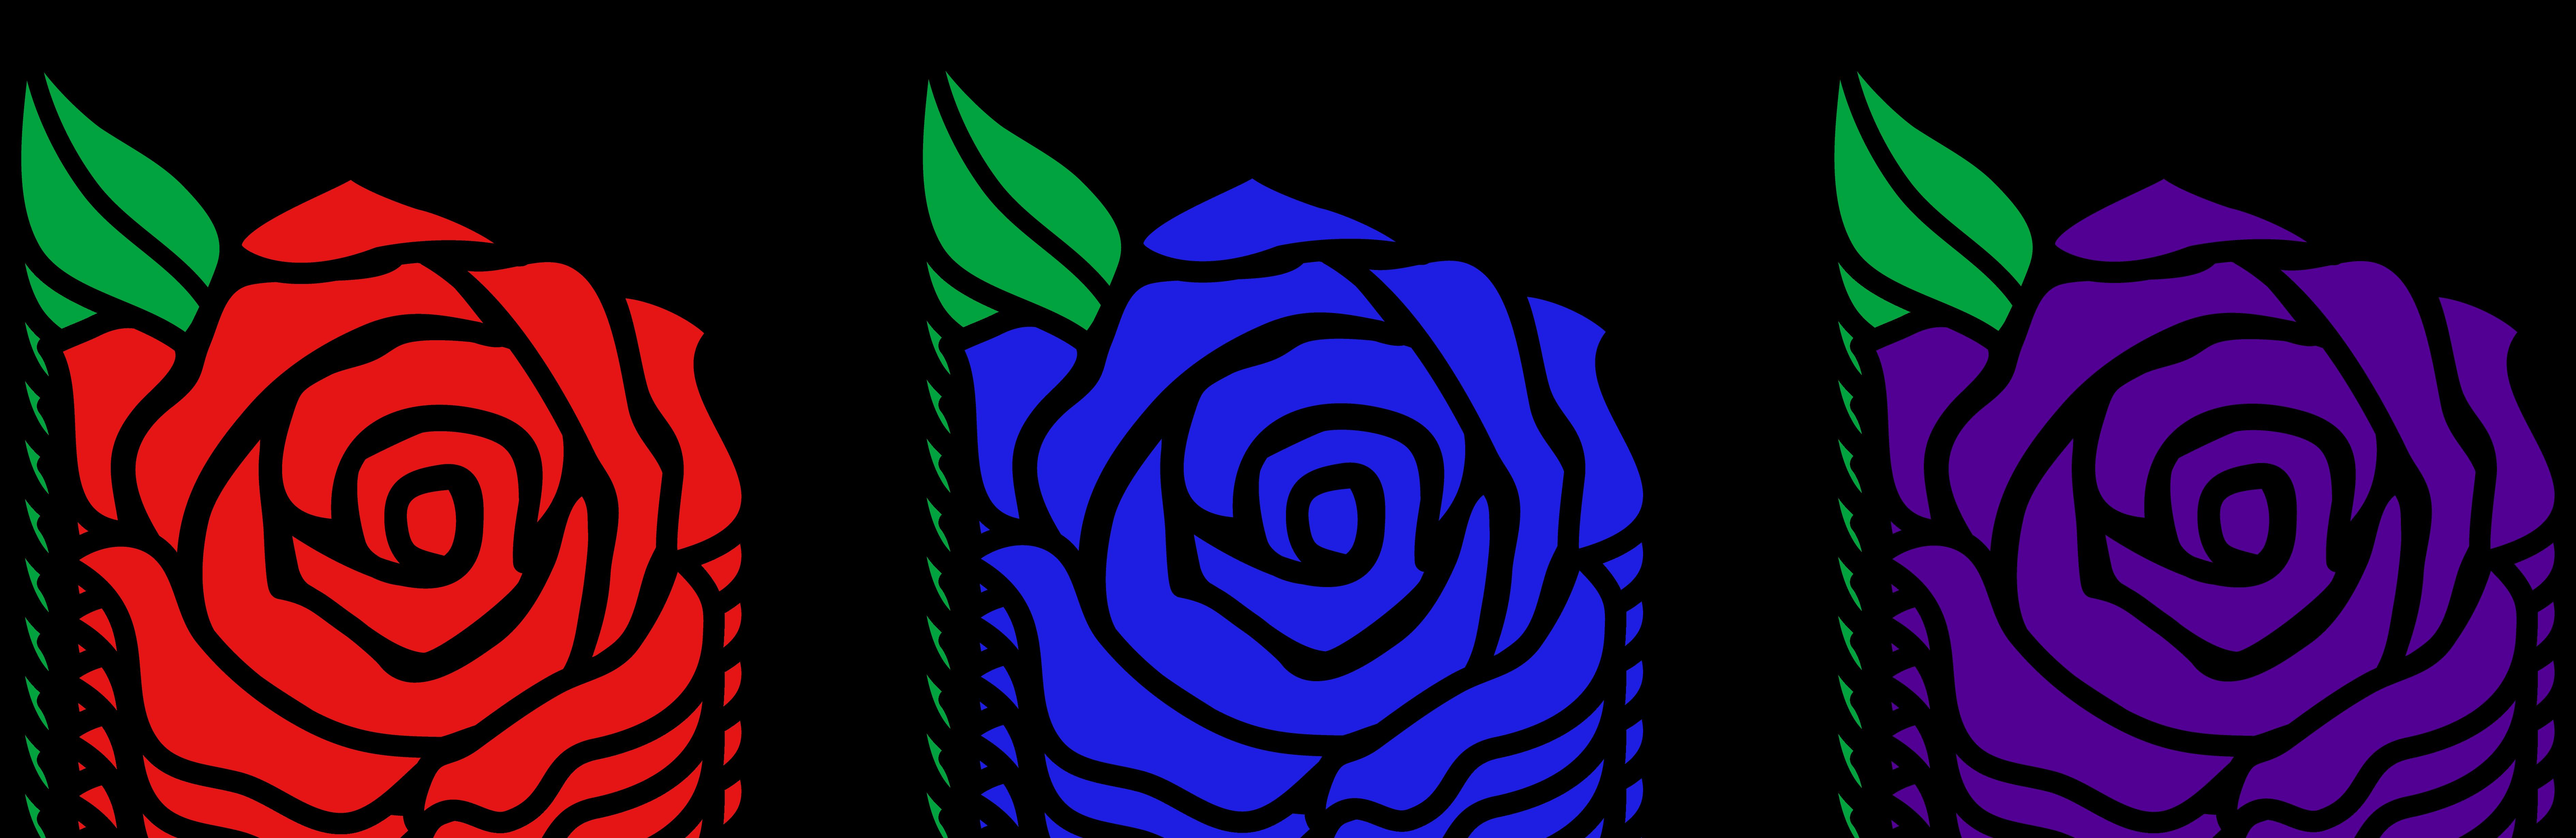 Cartoon Rose Cliparts